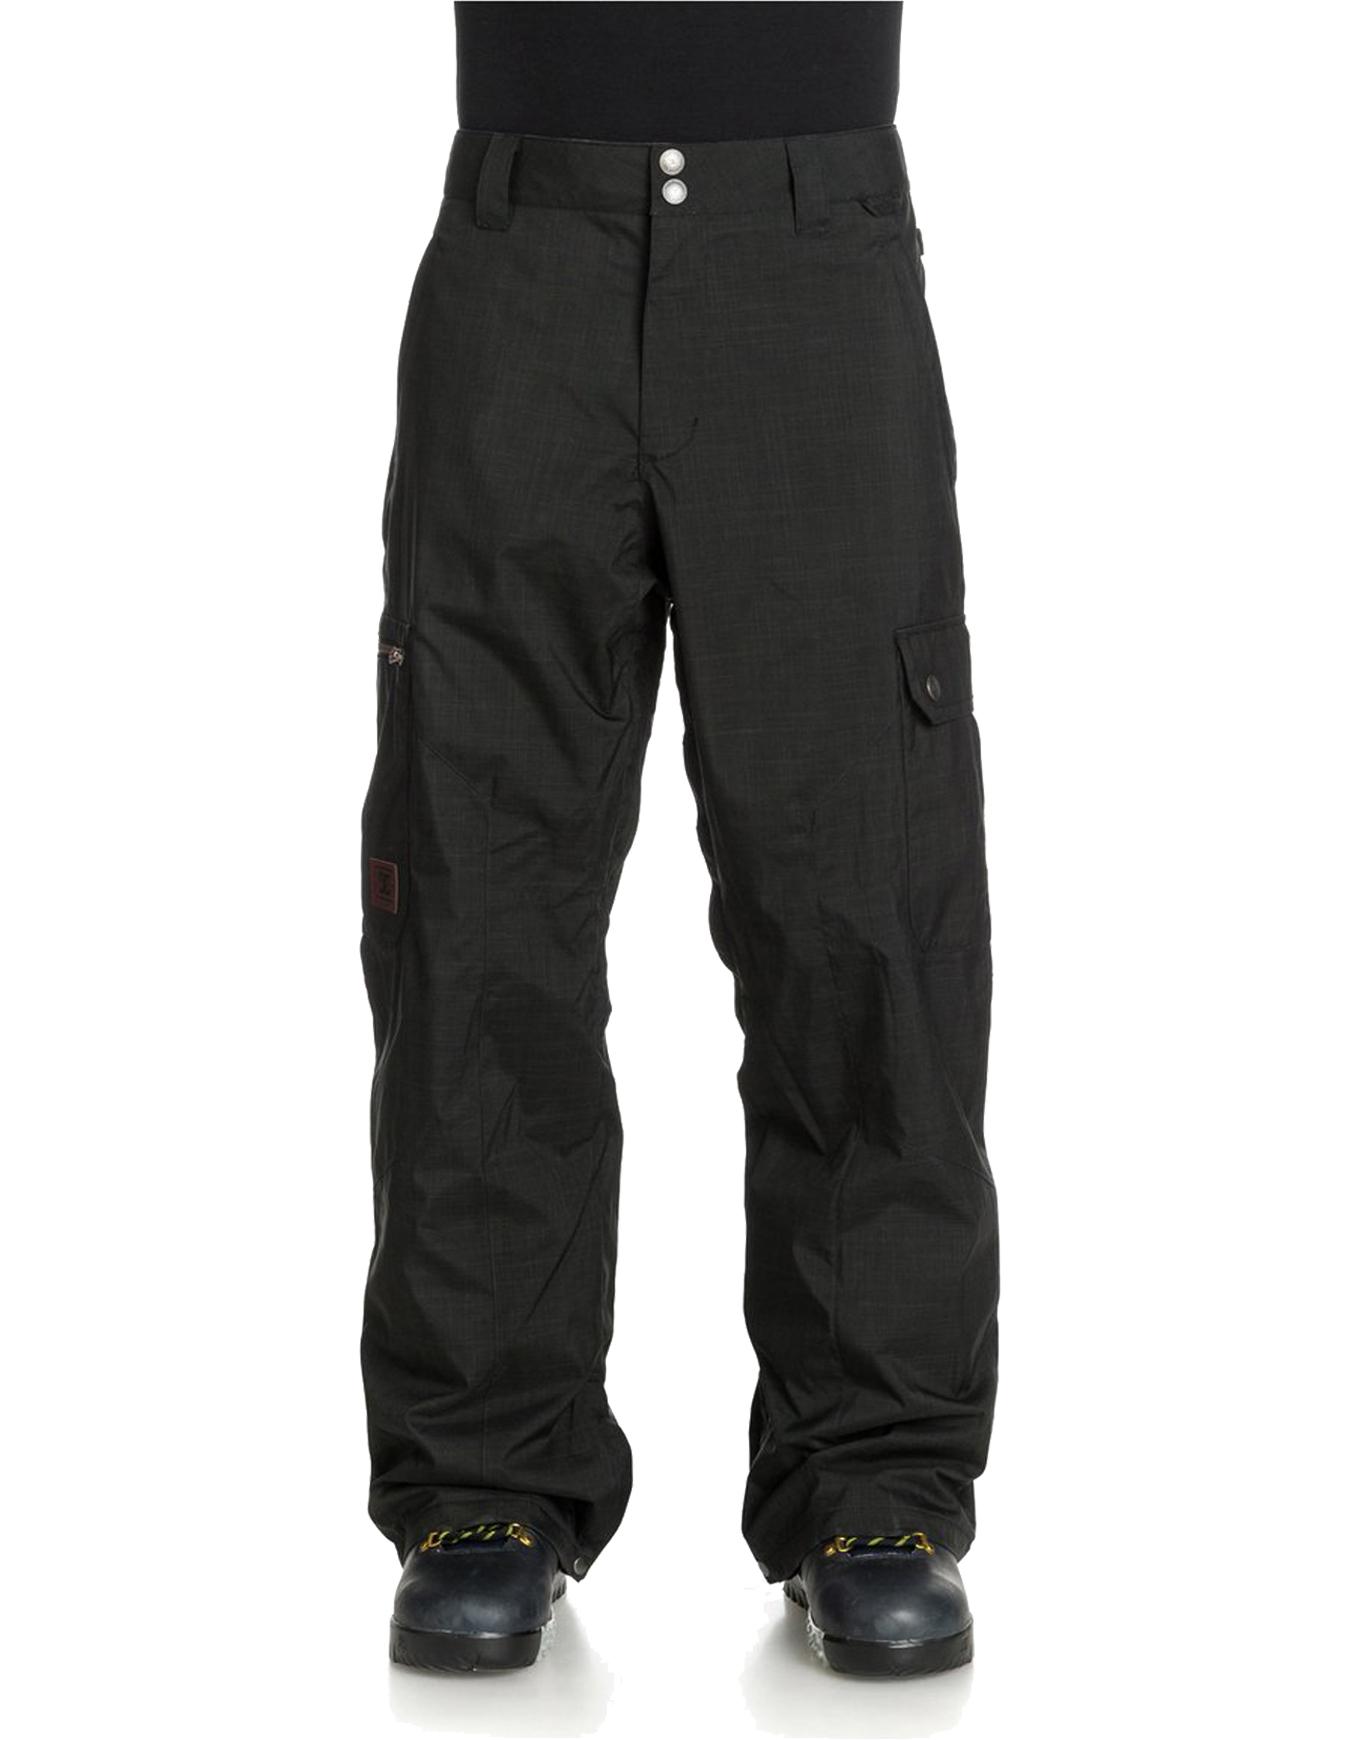 9a7a304c8aa2f Pantalon de ski homme, combinaison ski homme, pantalons snow ...